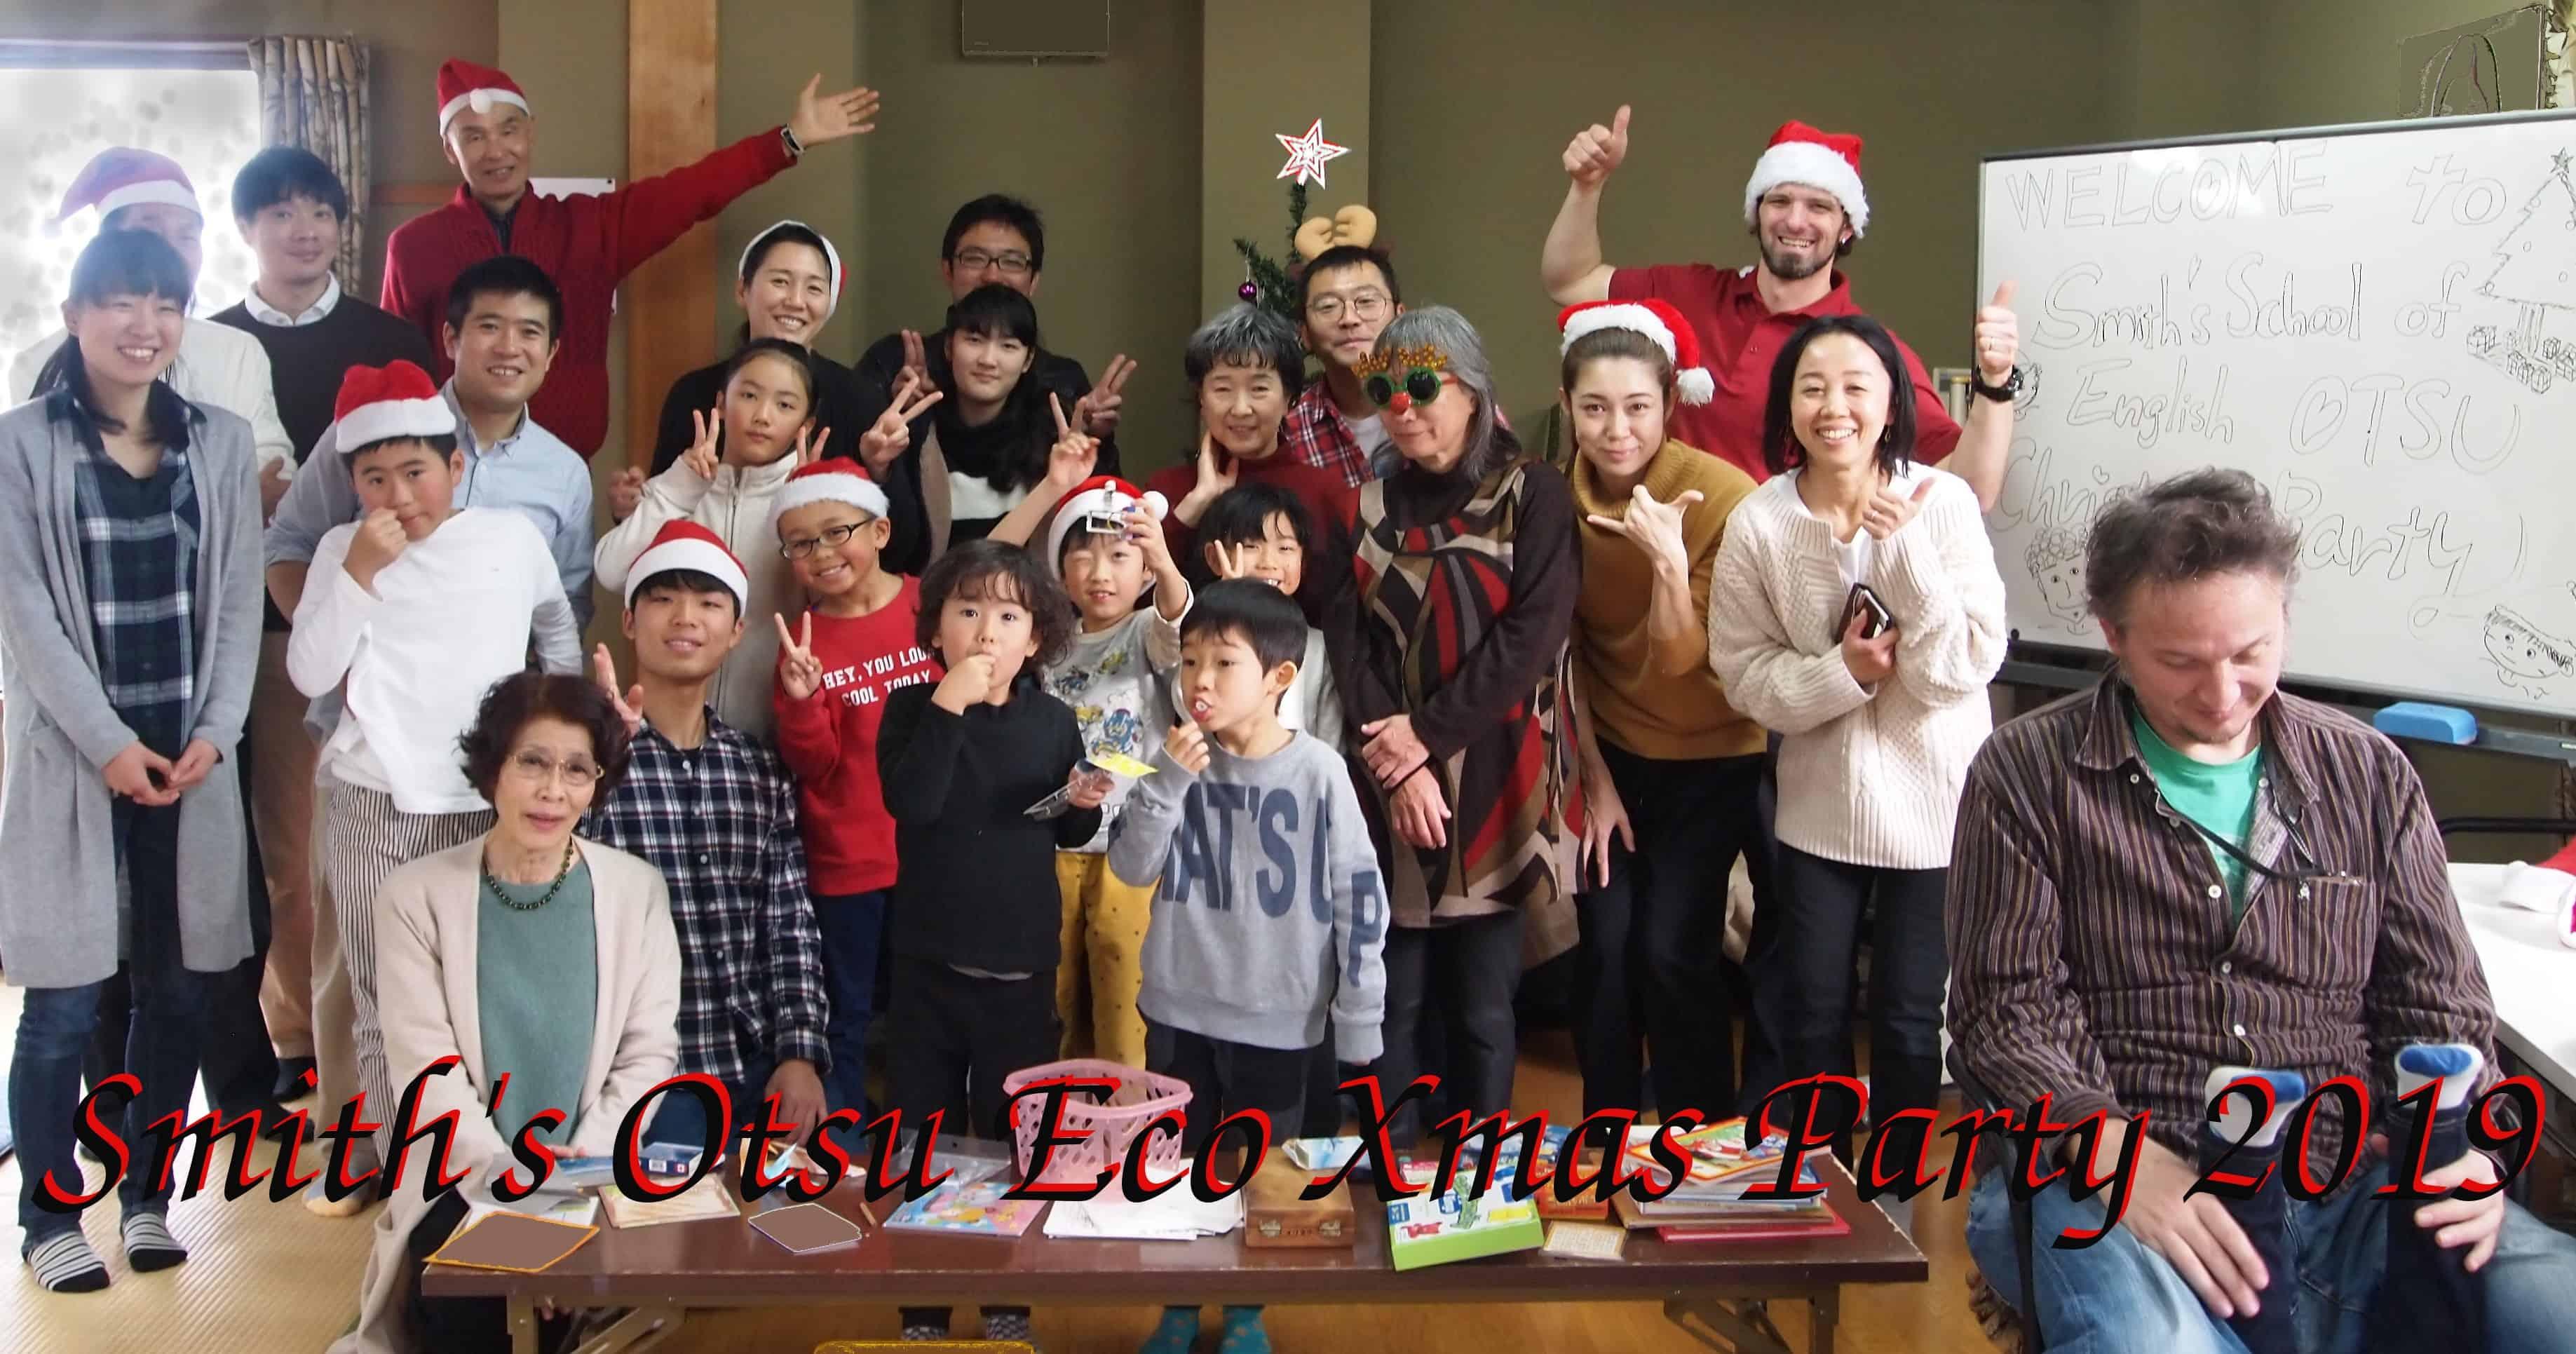 Smith's School of English Otsu Eco-Potluck Christmas party 2019